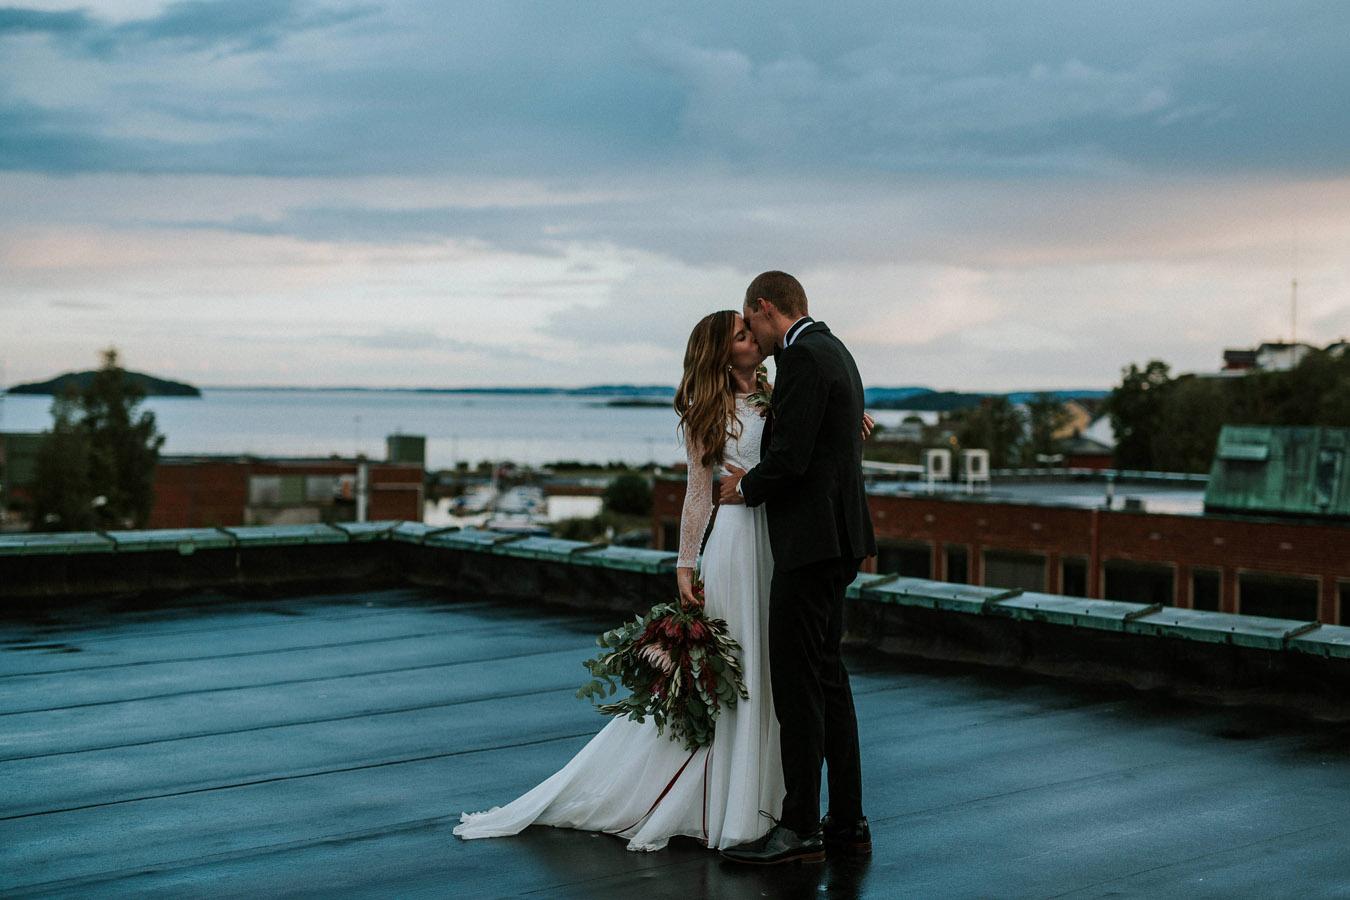 Fotograf-Tone-Tvedt-bryllup-101.jpg